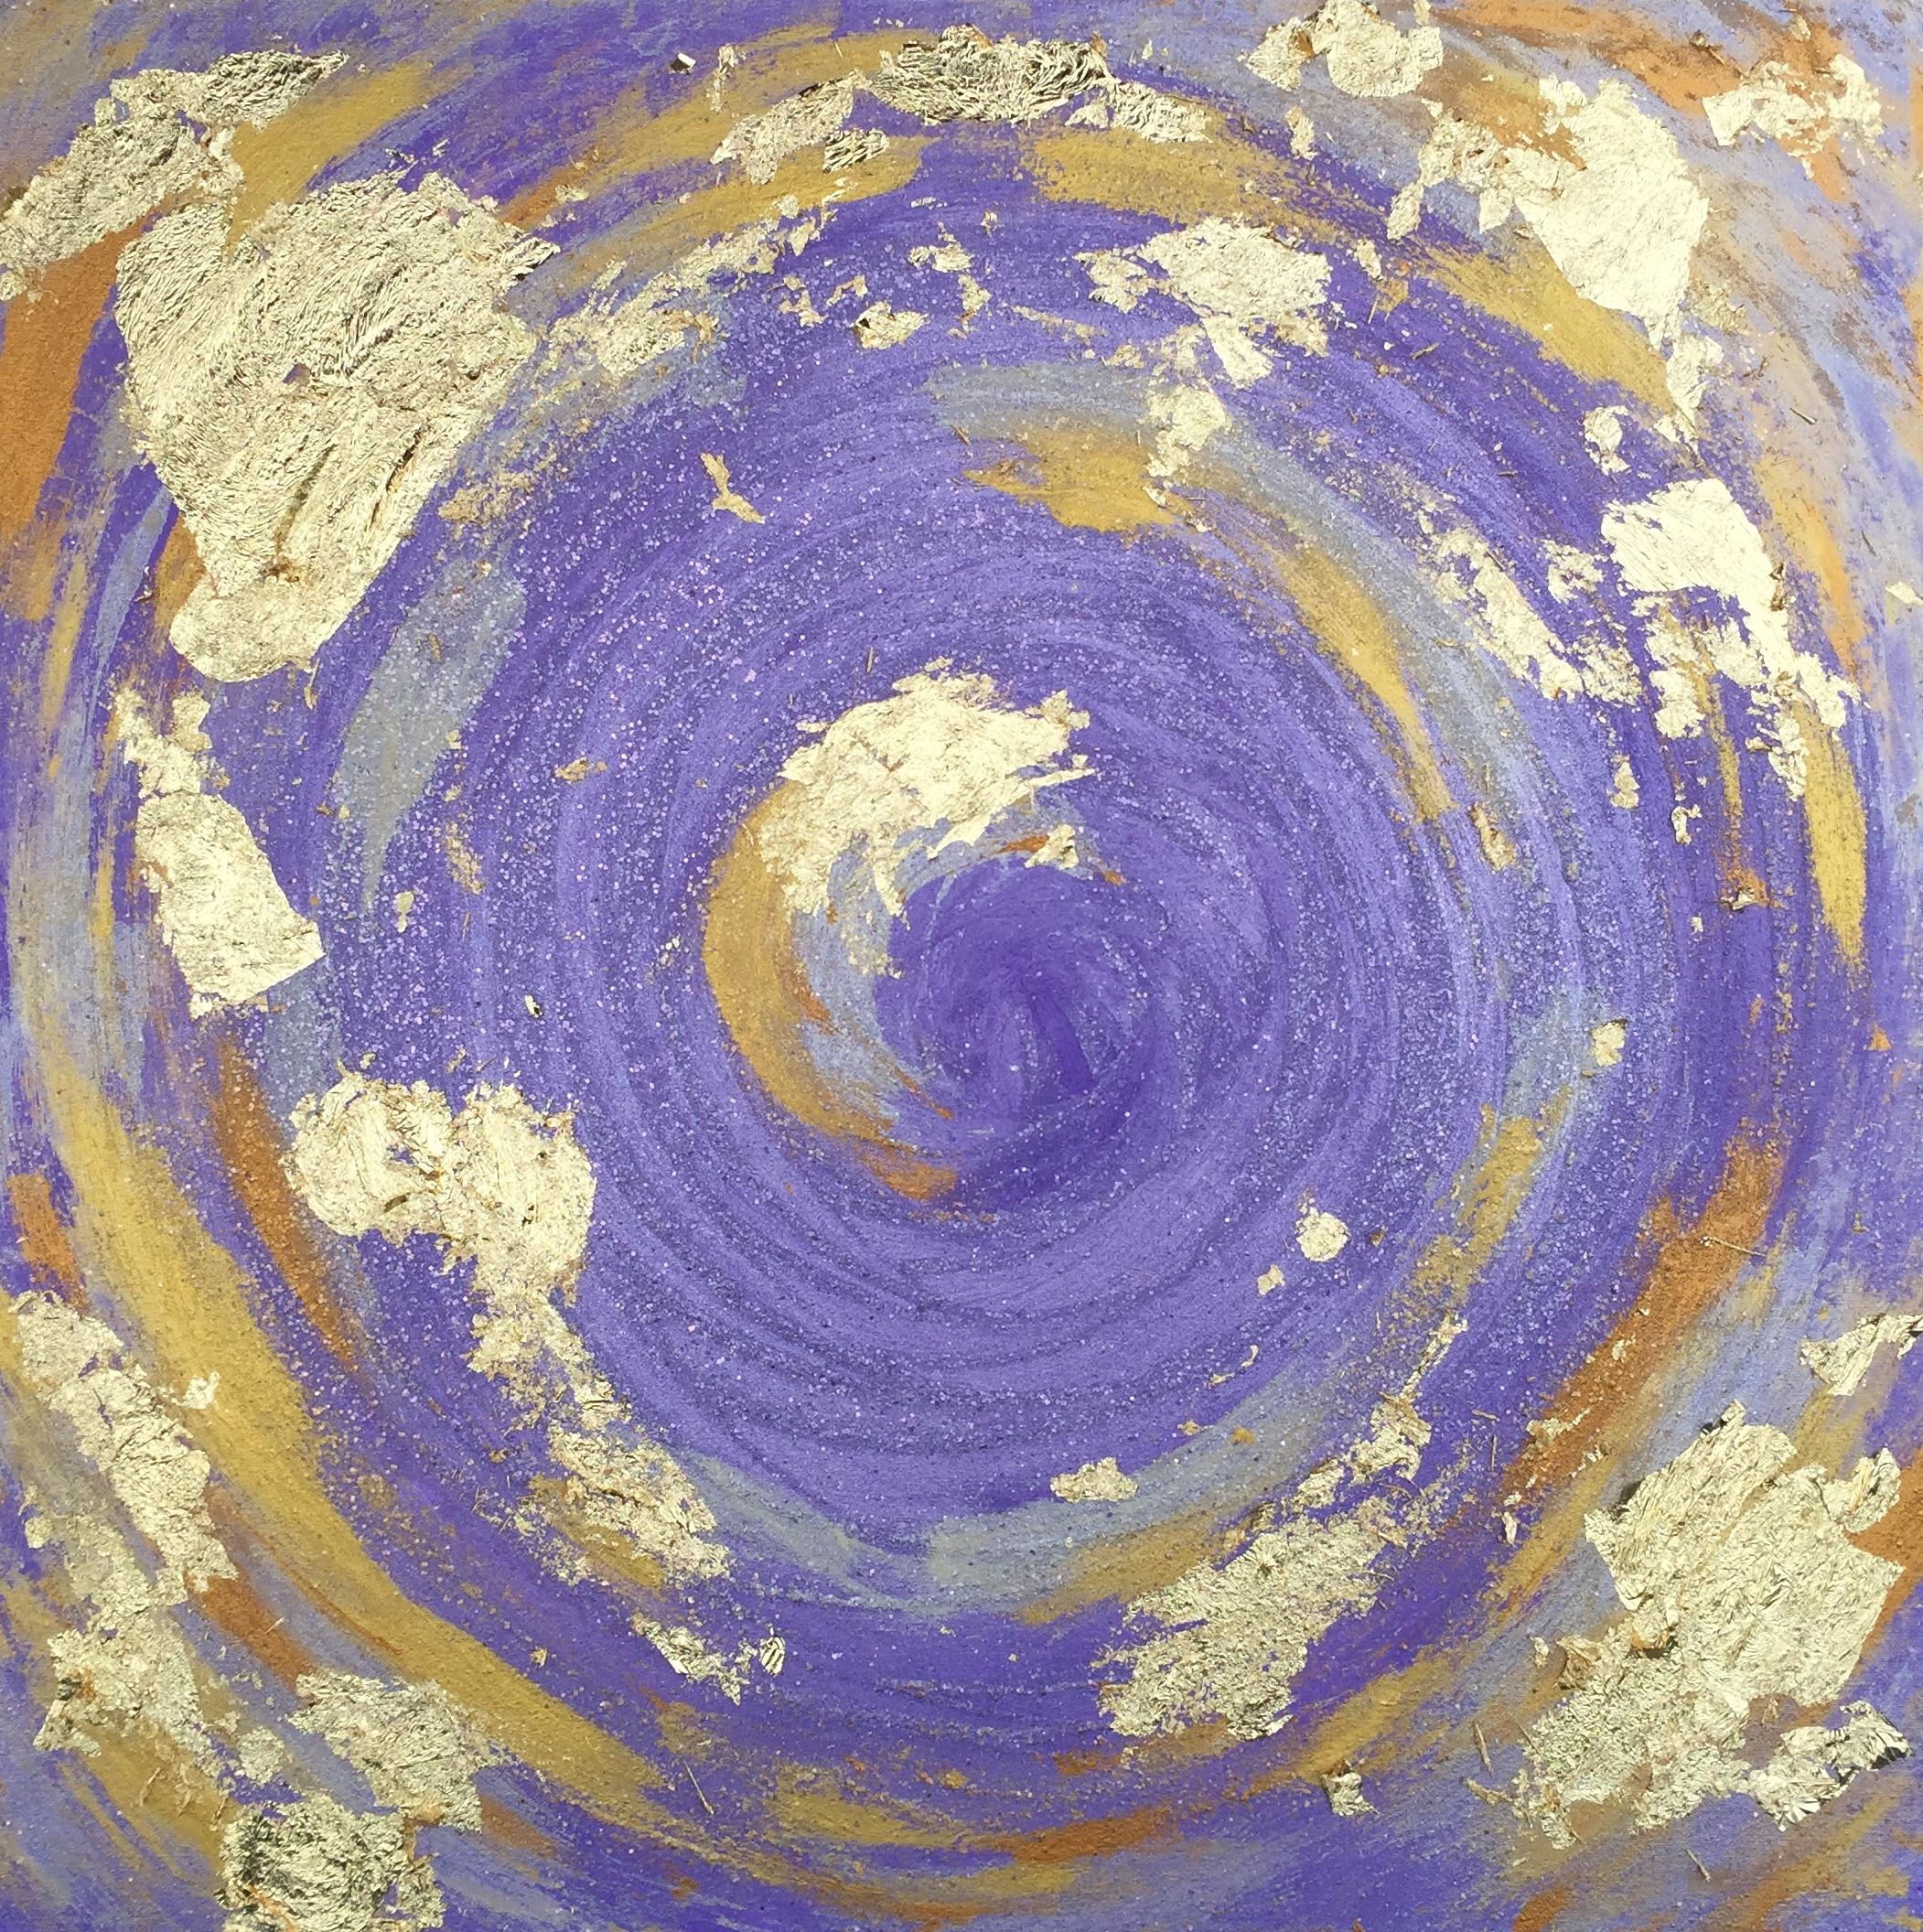 Violet Love VII - Sarah Arensi